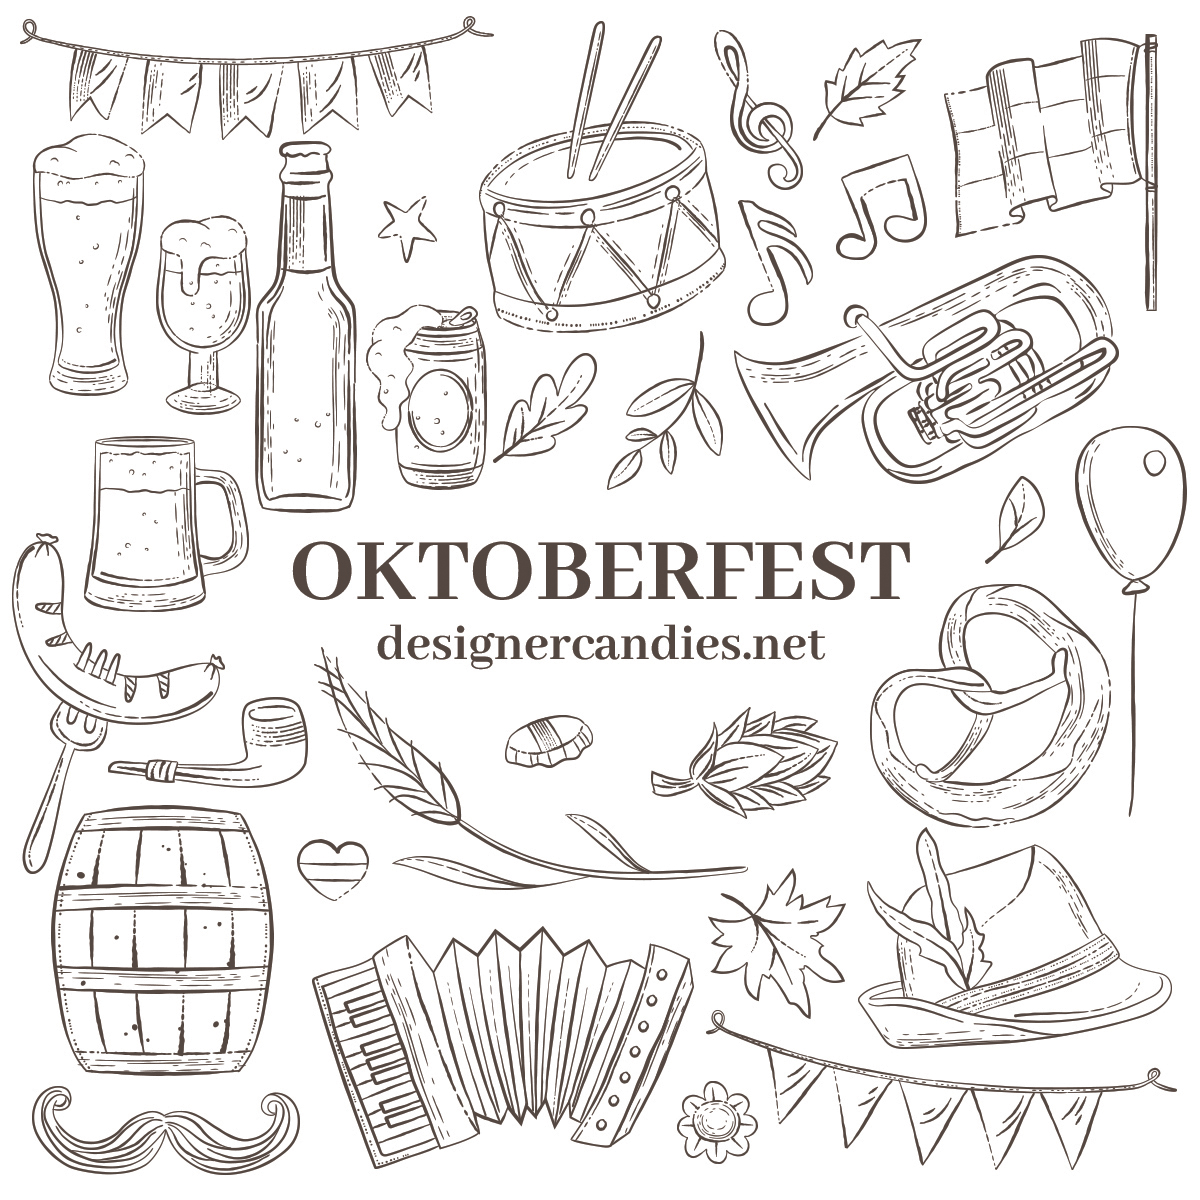 Oktoberfest Line Art Illustrations